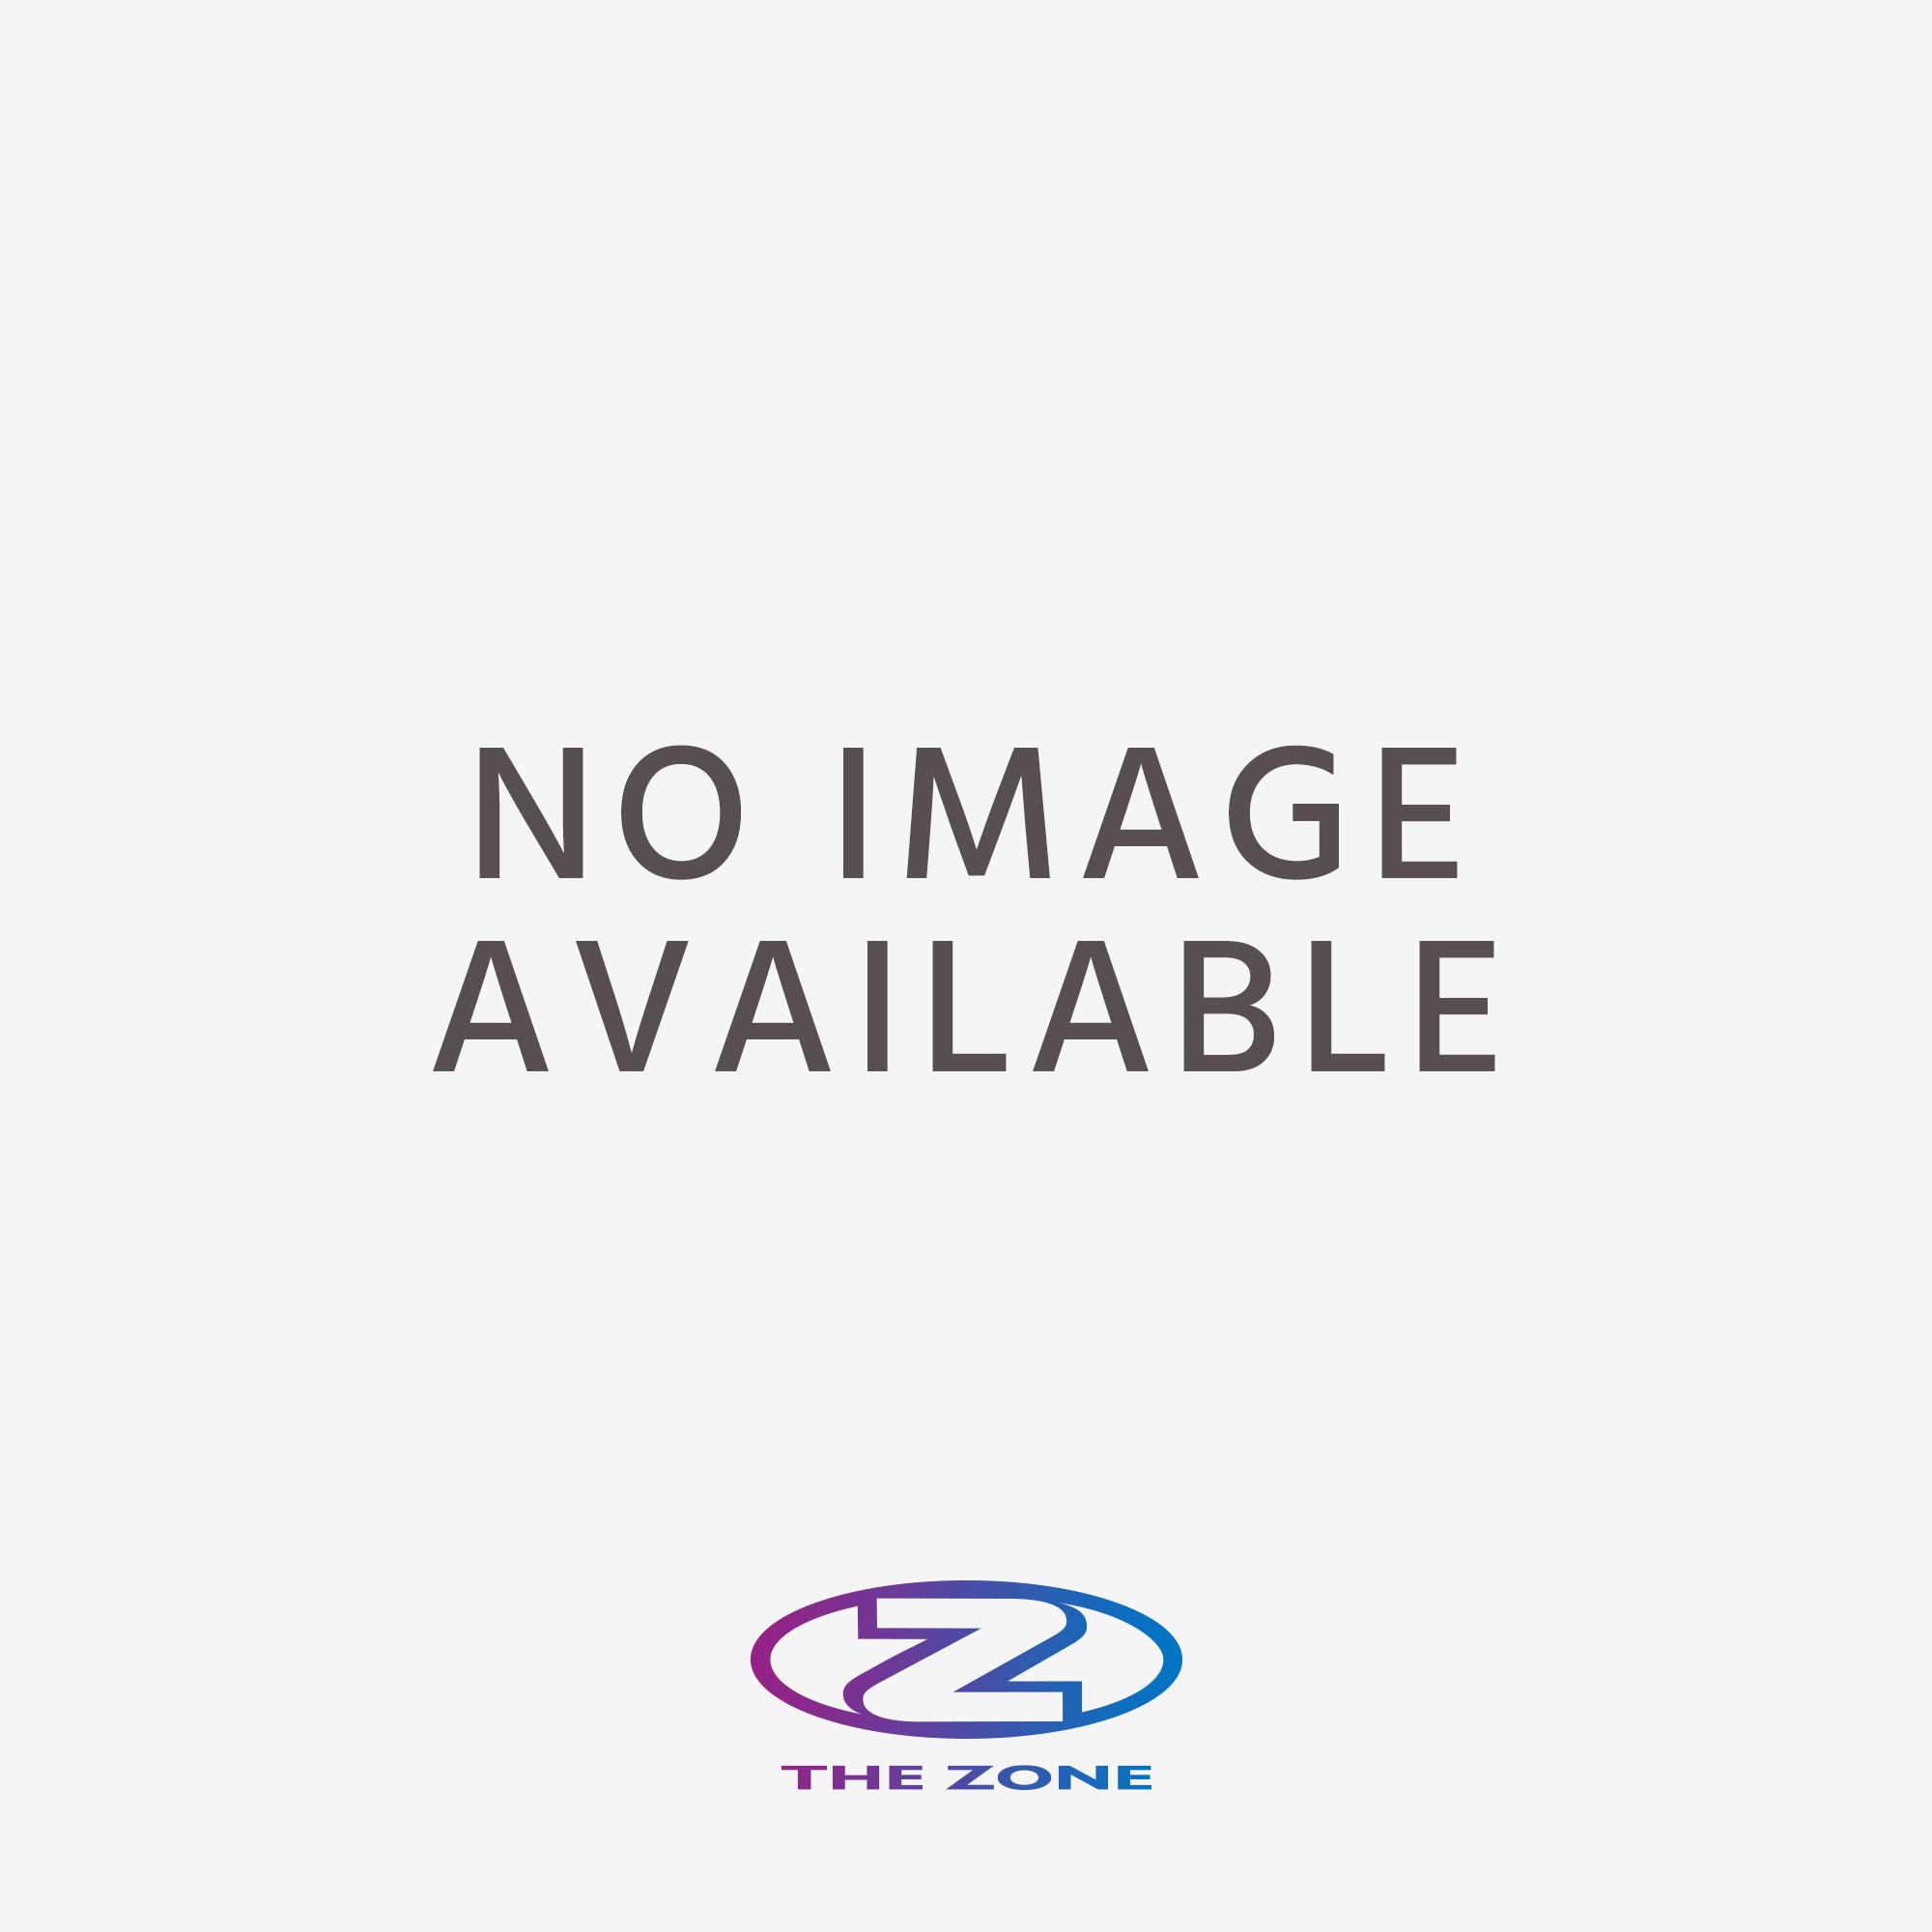 Tiara Crystal Motif Long Sleeved Gymnastics Leotard